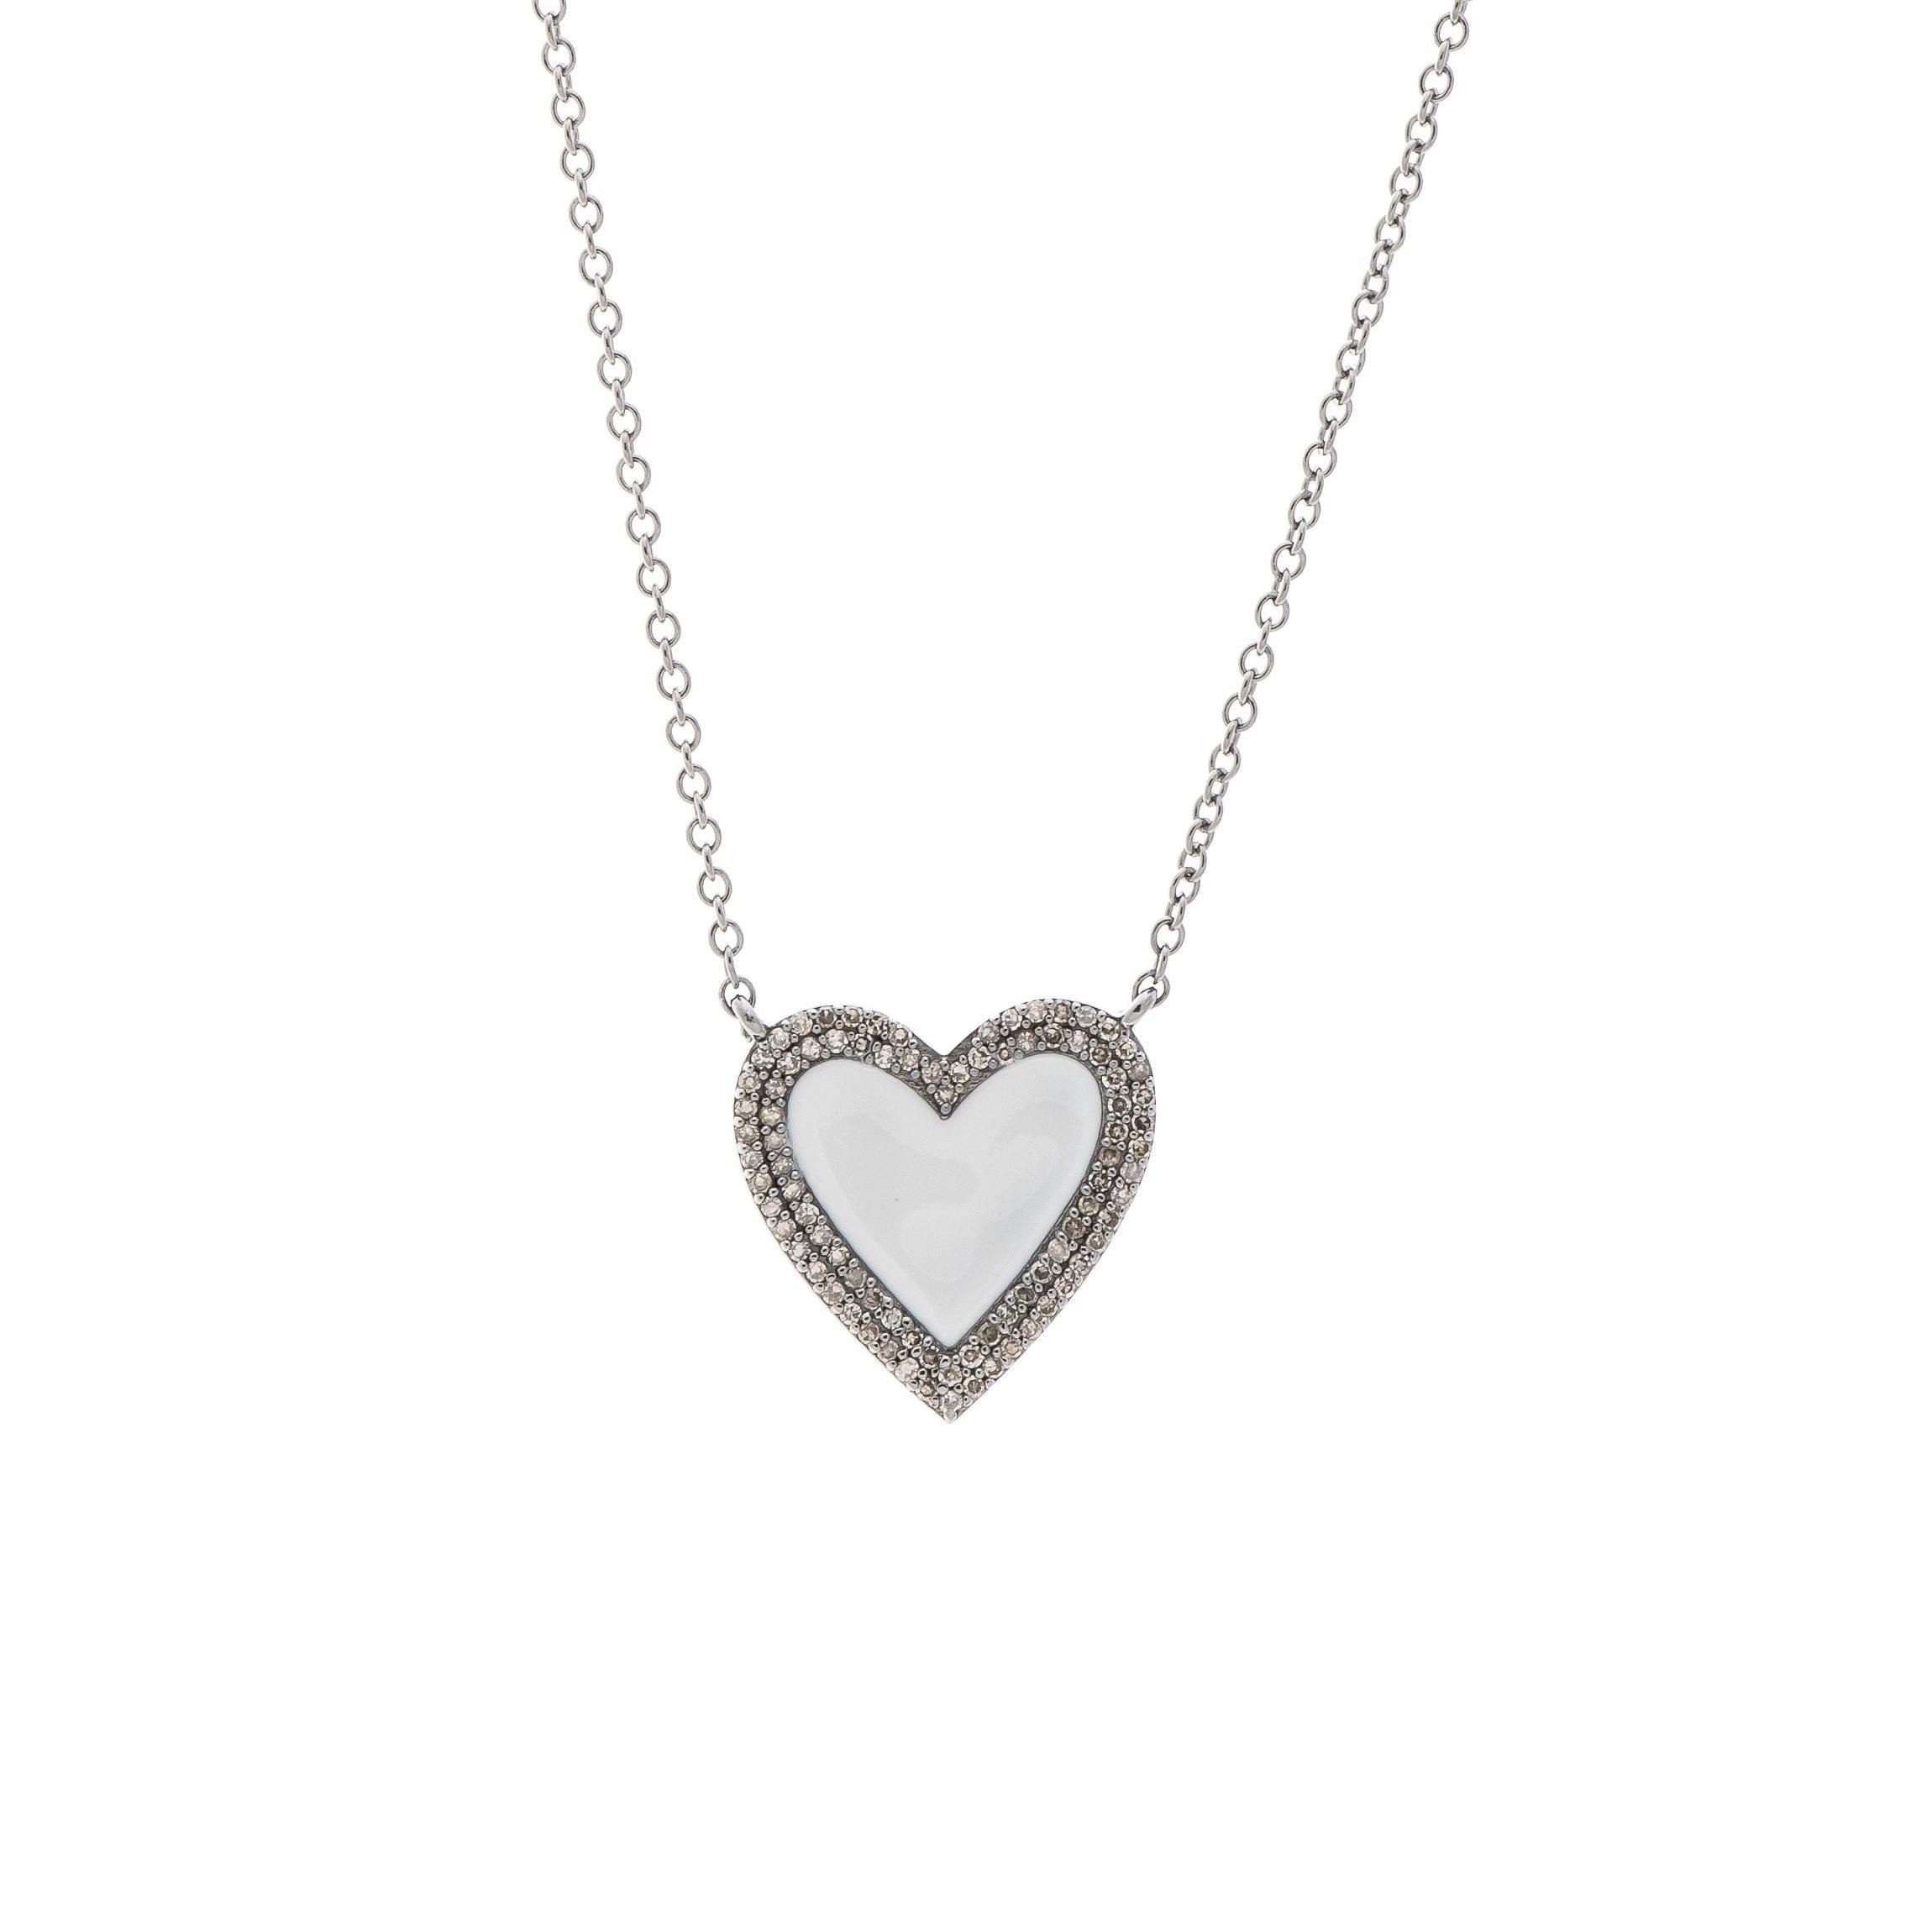 Medium Diamond White Enamel Heart Necklace